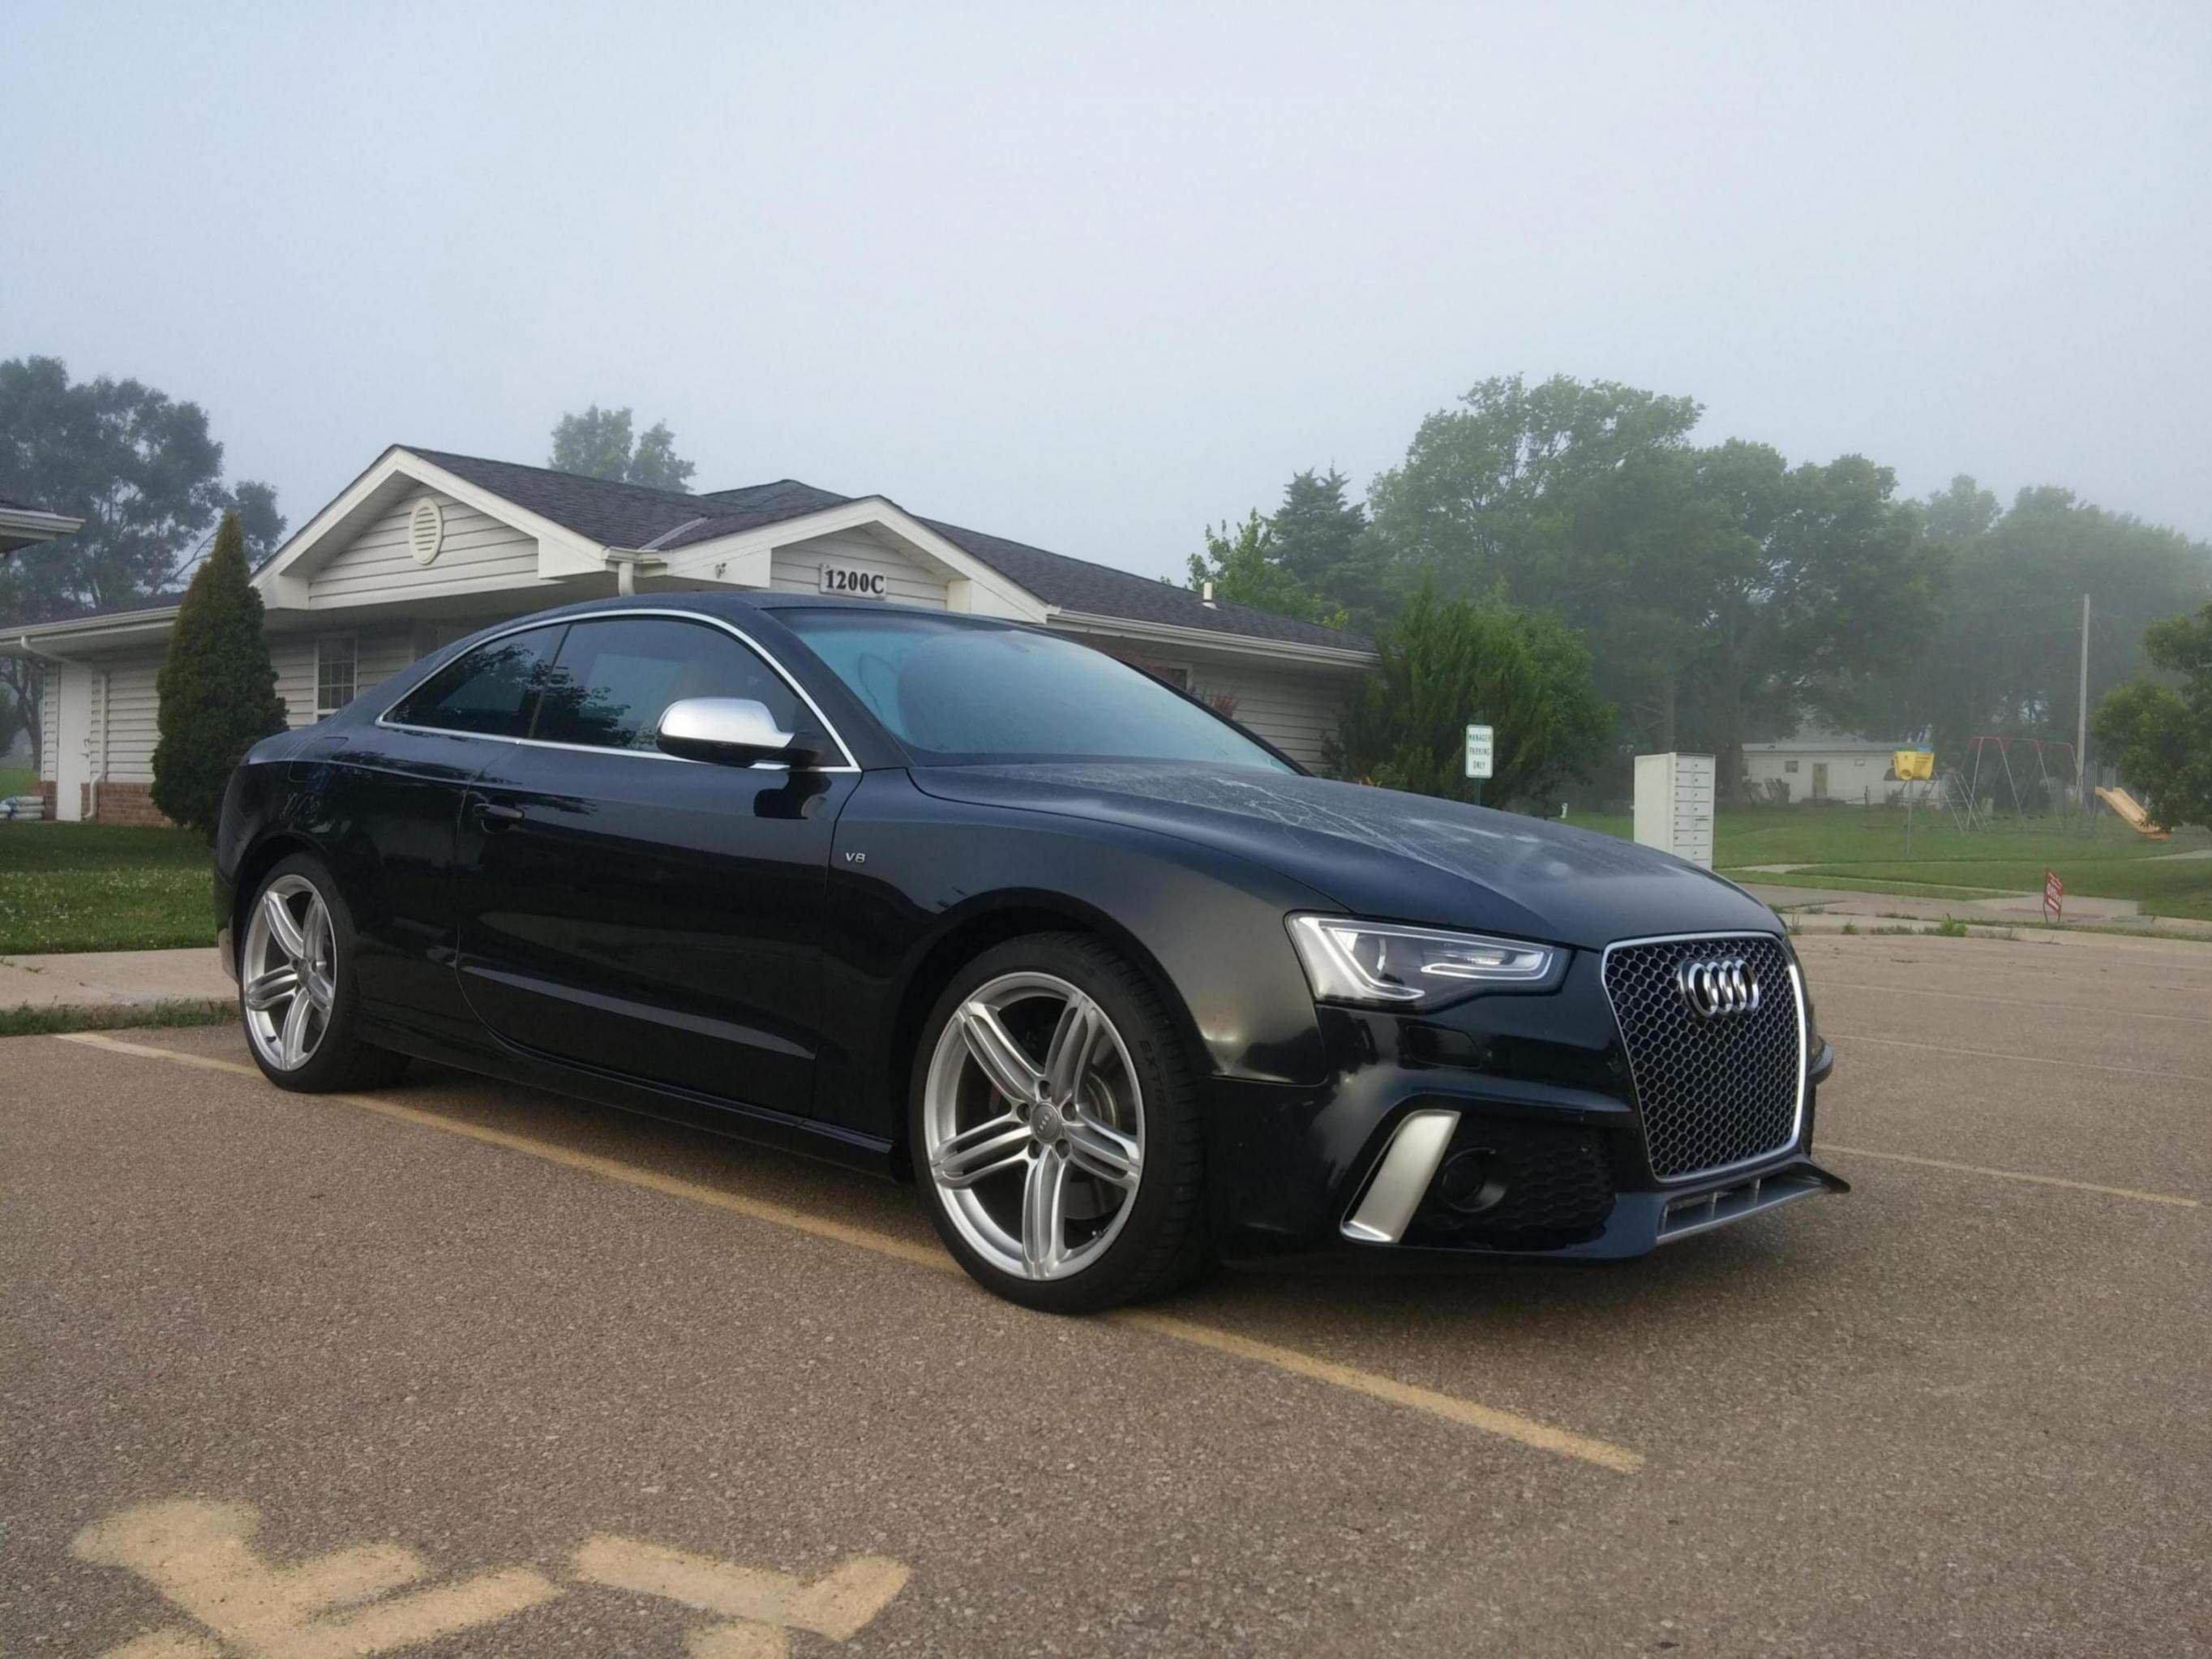 Audi S5 2011 (B8) to 2013 (B8 5) facelift | Audi A5 Forum